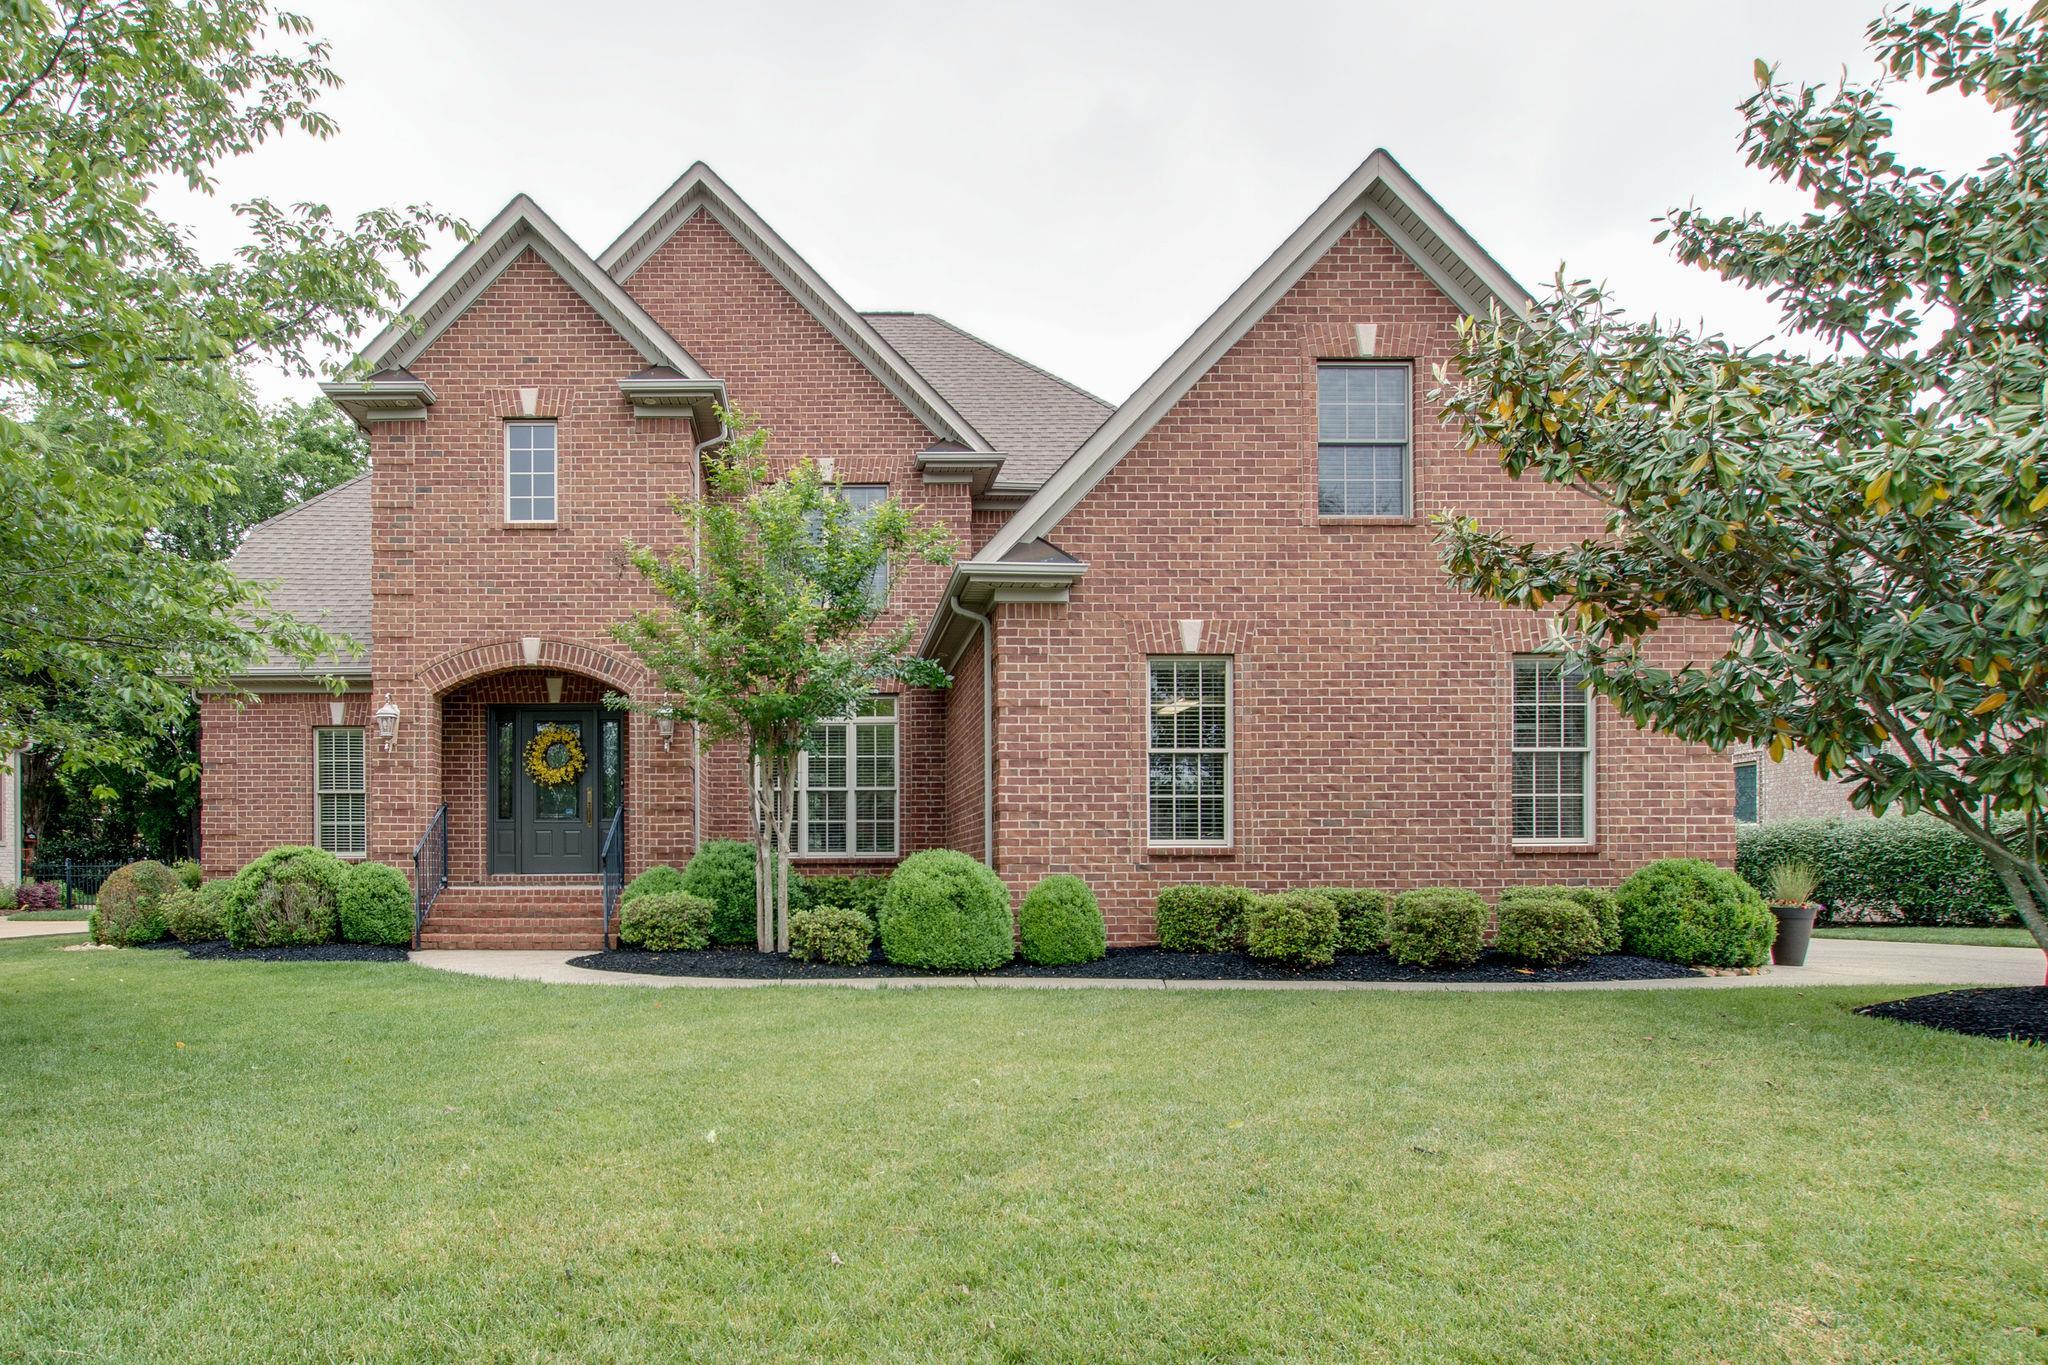 2034 Alexander Blvd, Murfreesboro, TN 37130 - Murfreesboro, TN real estate listing